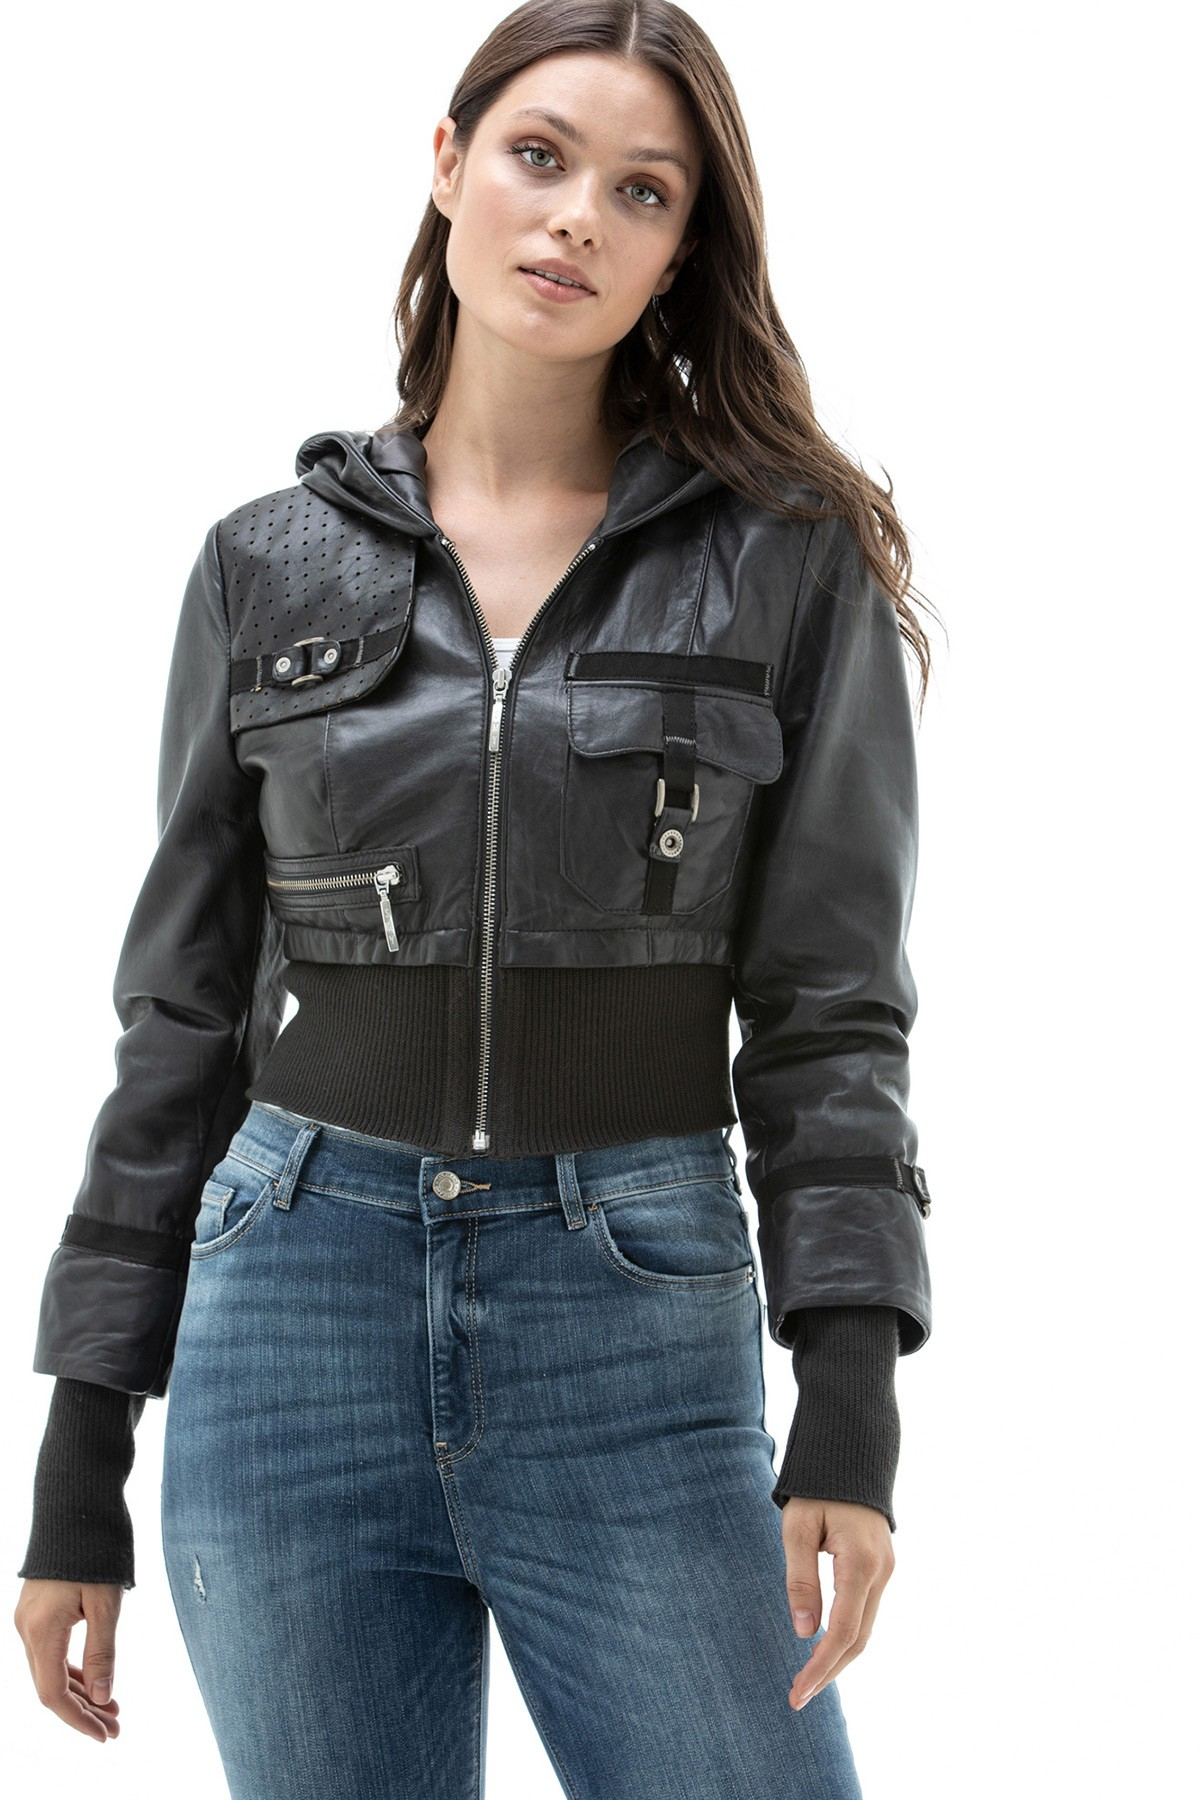 Black Burberry Leather Jacket